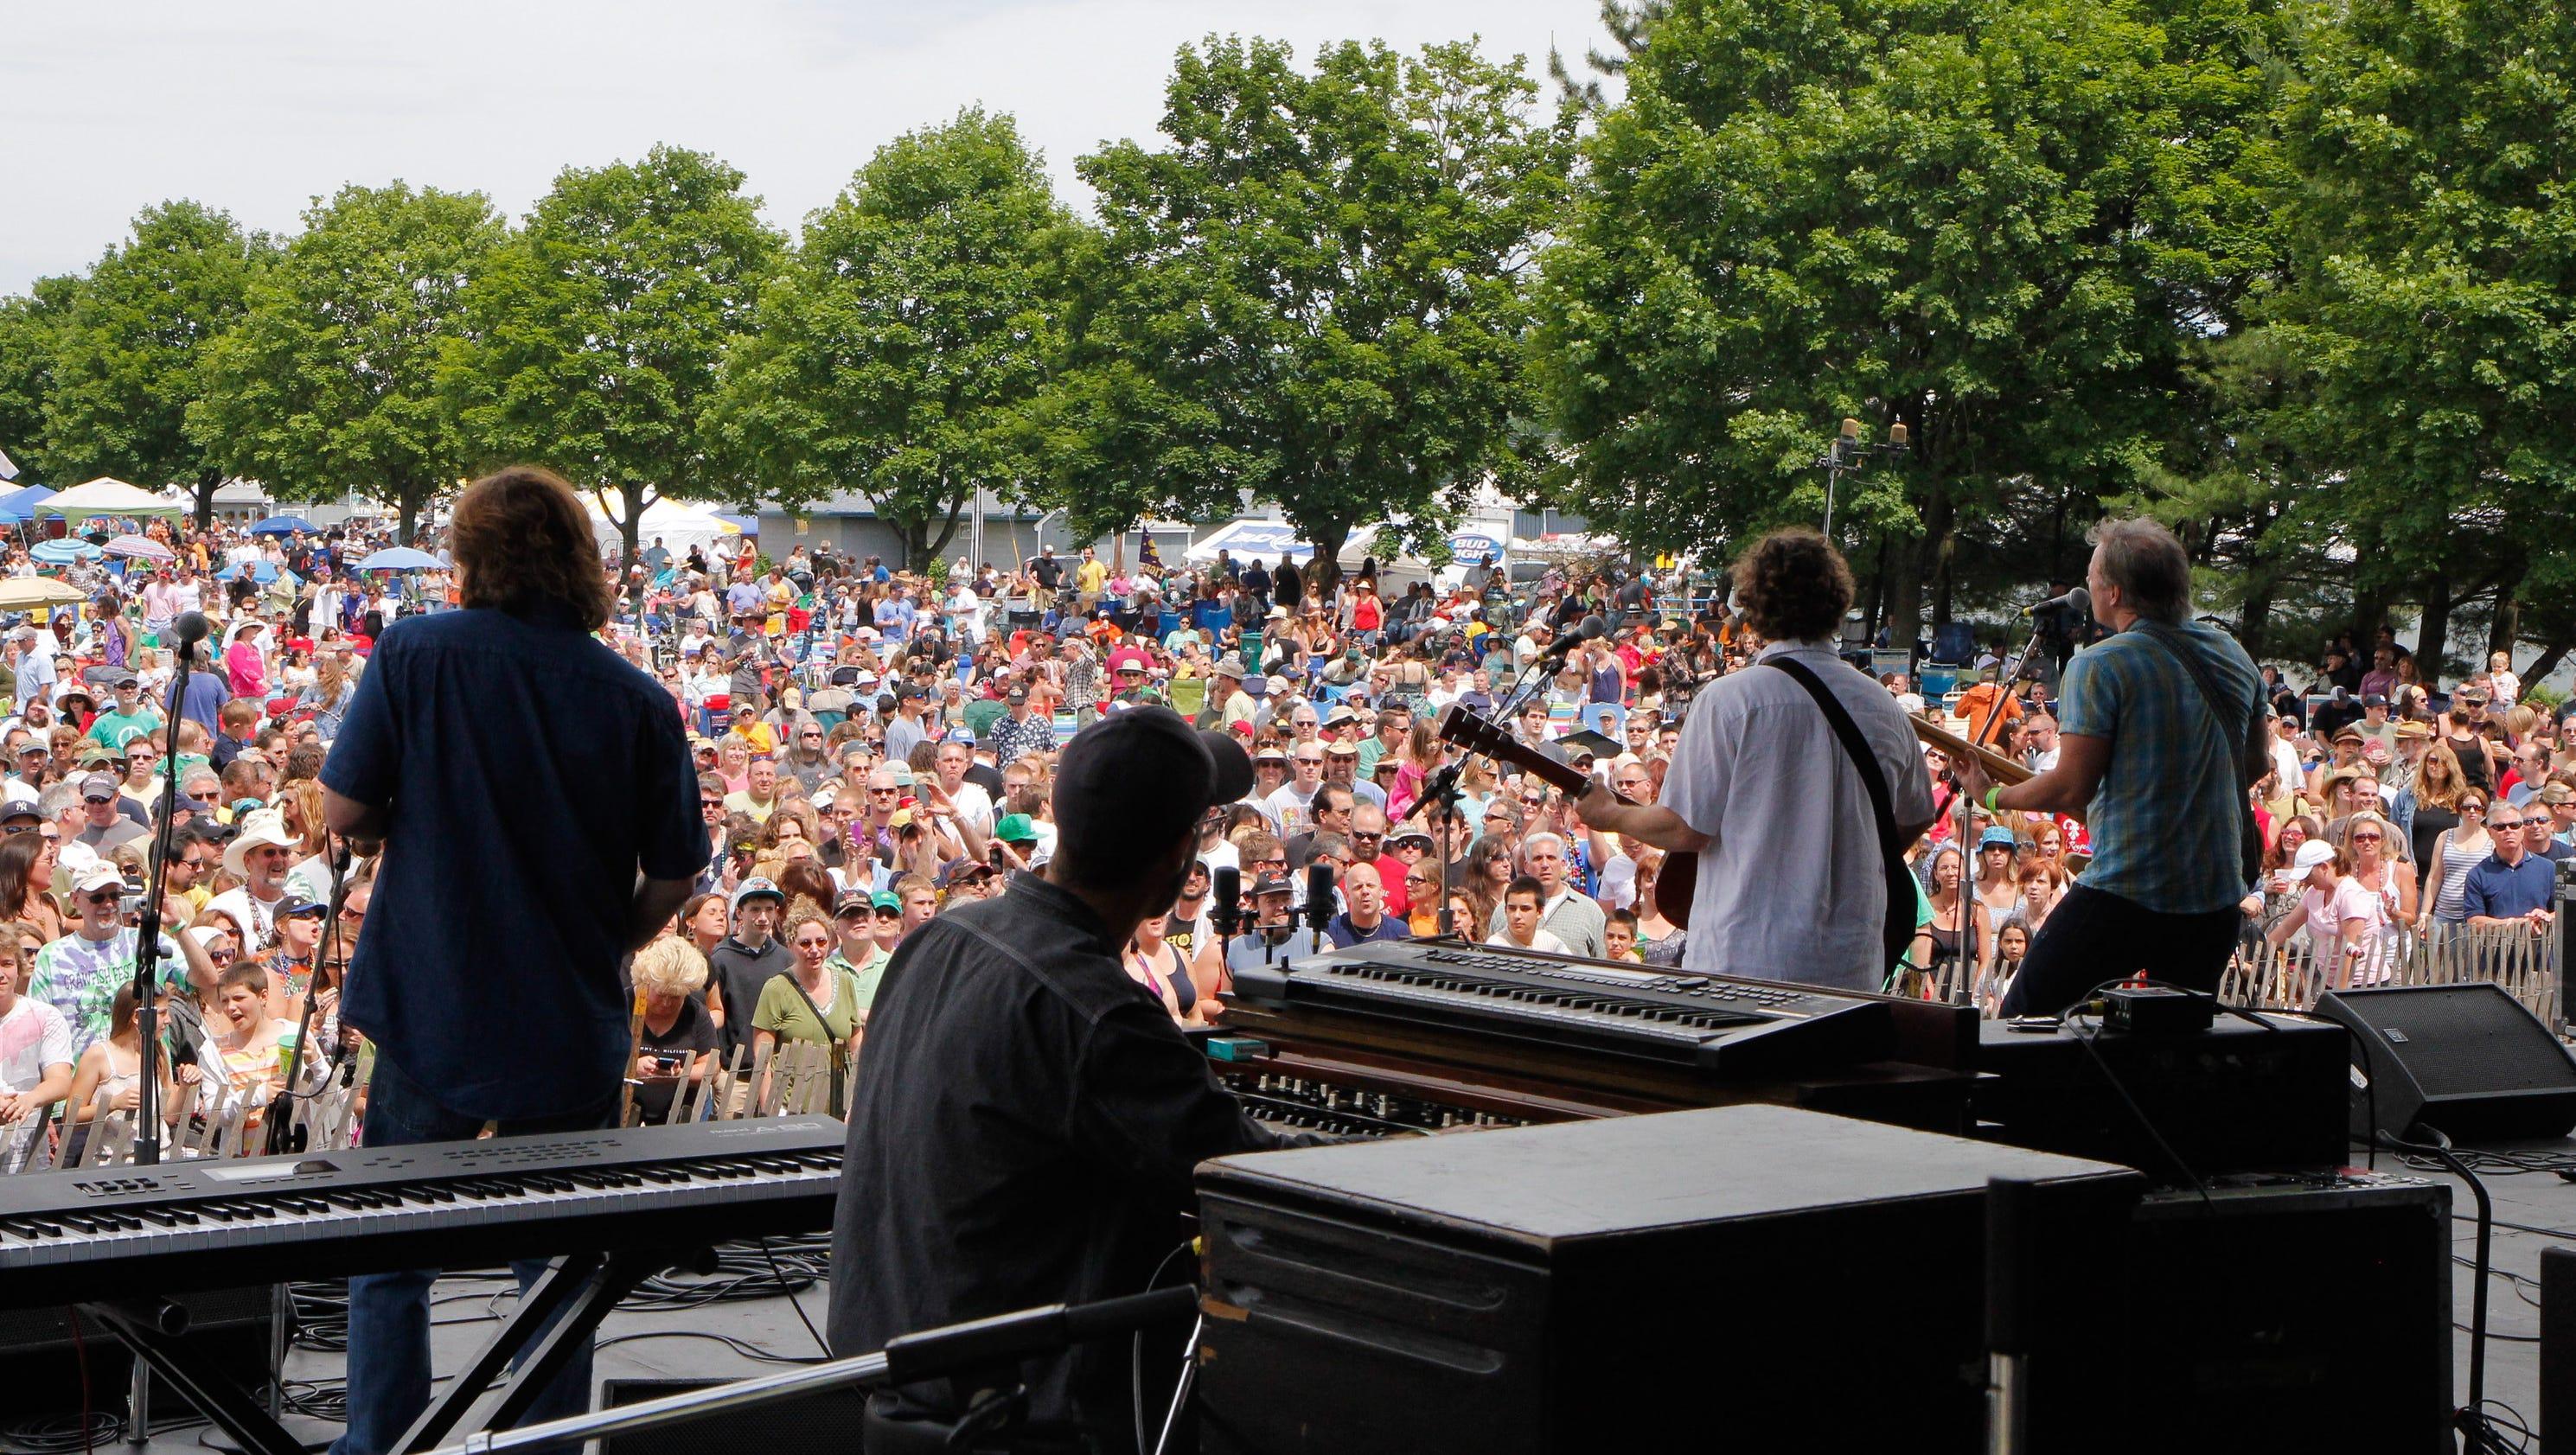 Music festivals offer fun — and funk — in the sun